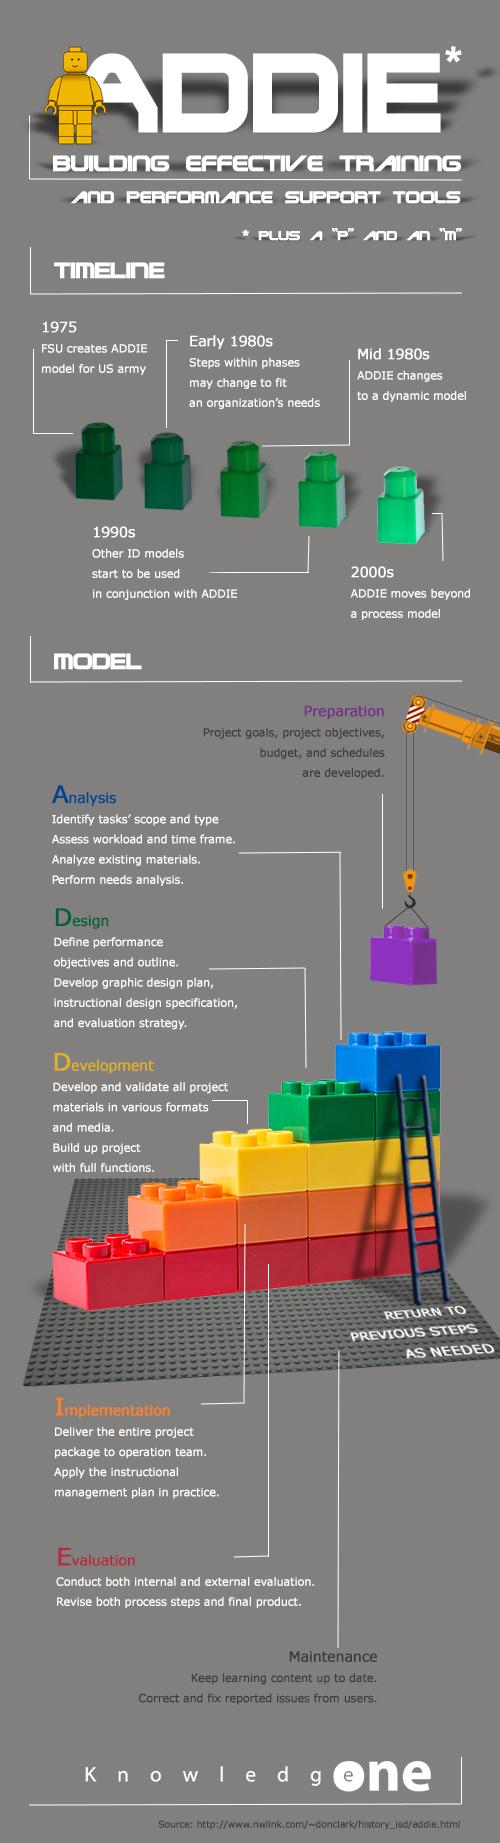 medium resolution of infographic representing the addie model